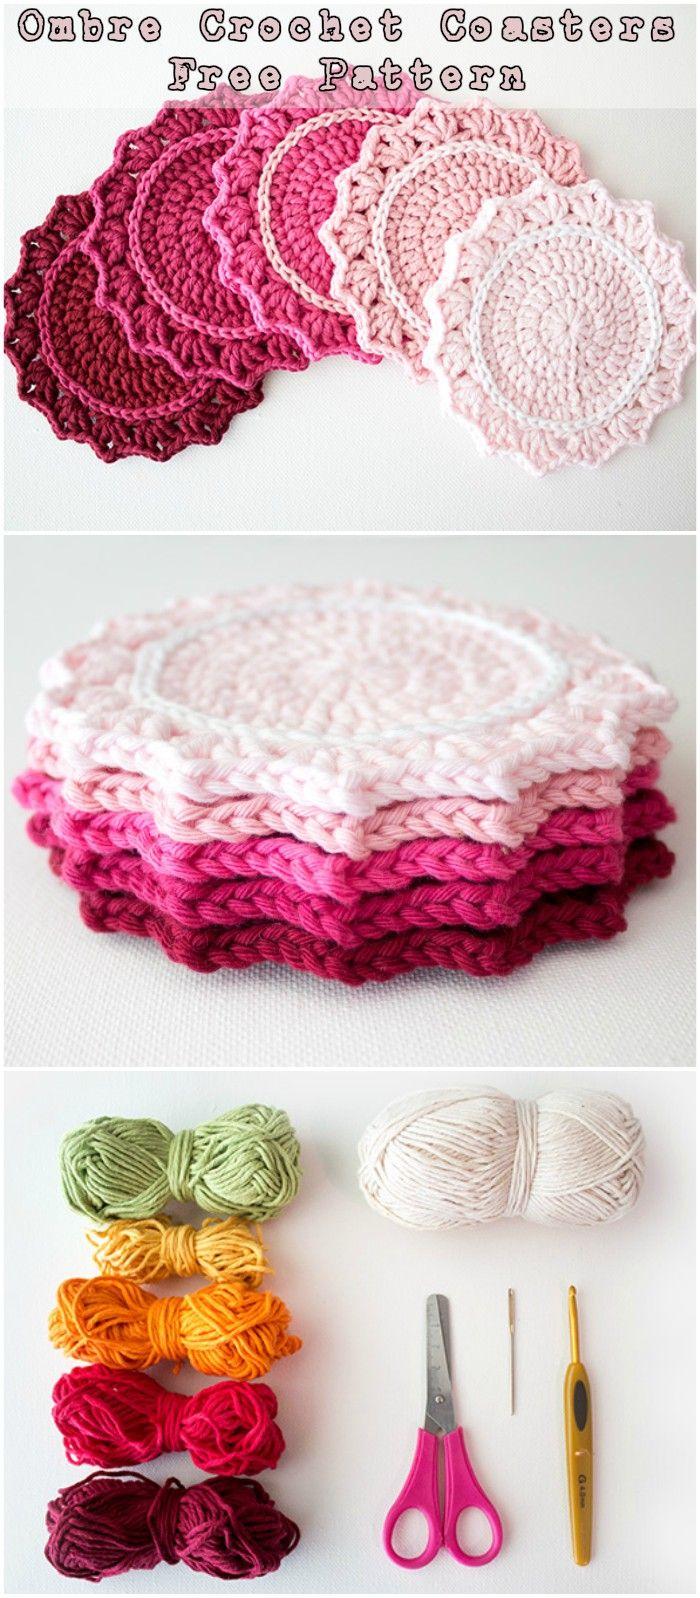 7 Brilliant Ideas for Crochet Coasters – Free Patterns | crochet ...